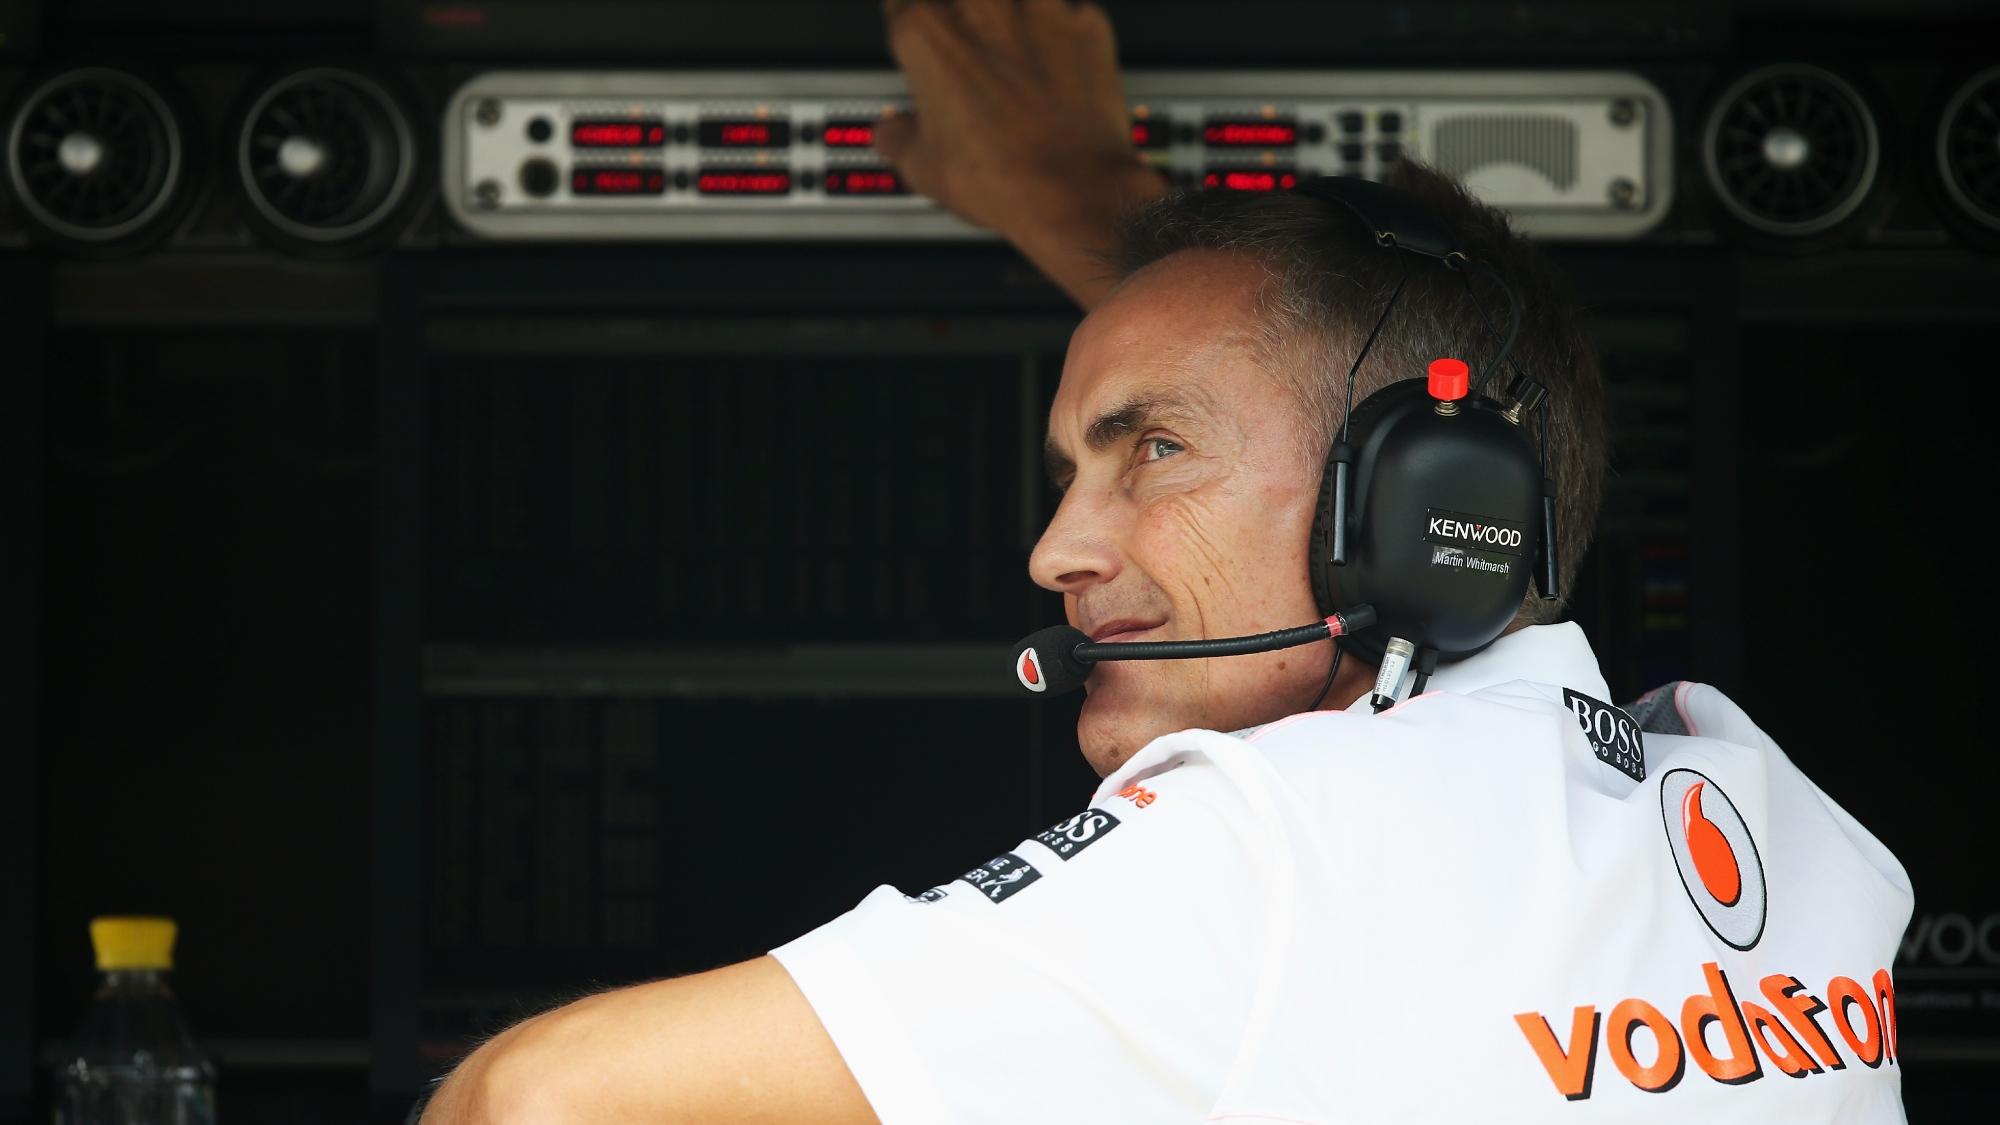 Martin Whitmarsh, McLaren 2013 Indian GP